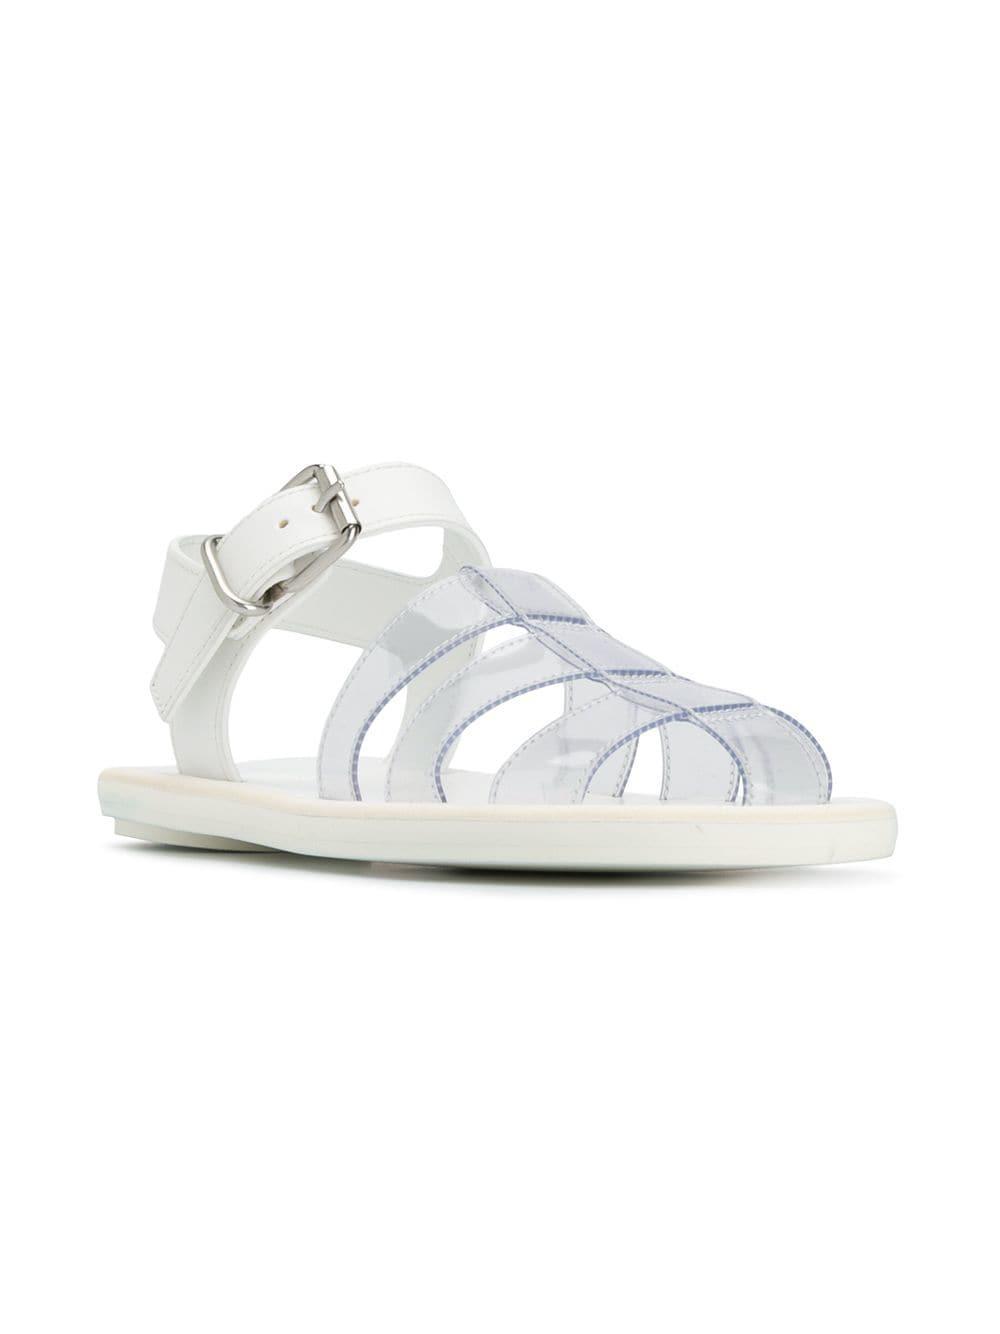 c17d5a3850b0 MM6 by Maison Martin Margiela - White Transparent Pool Sandals - Lyst. View  fullscreen